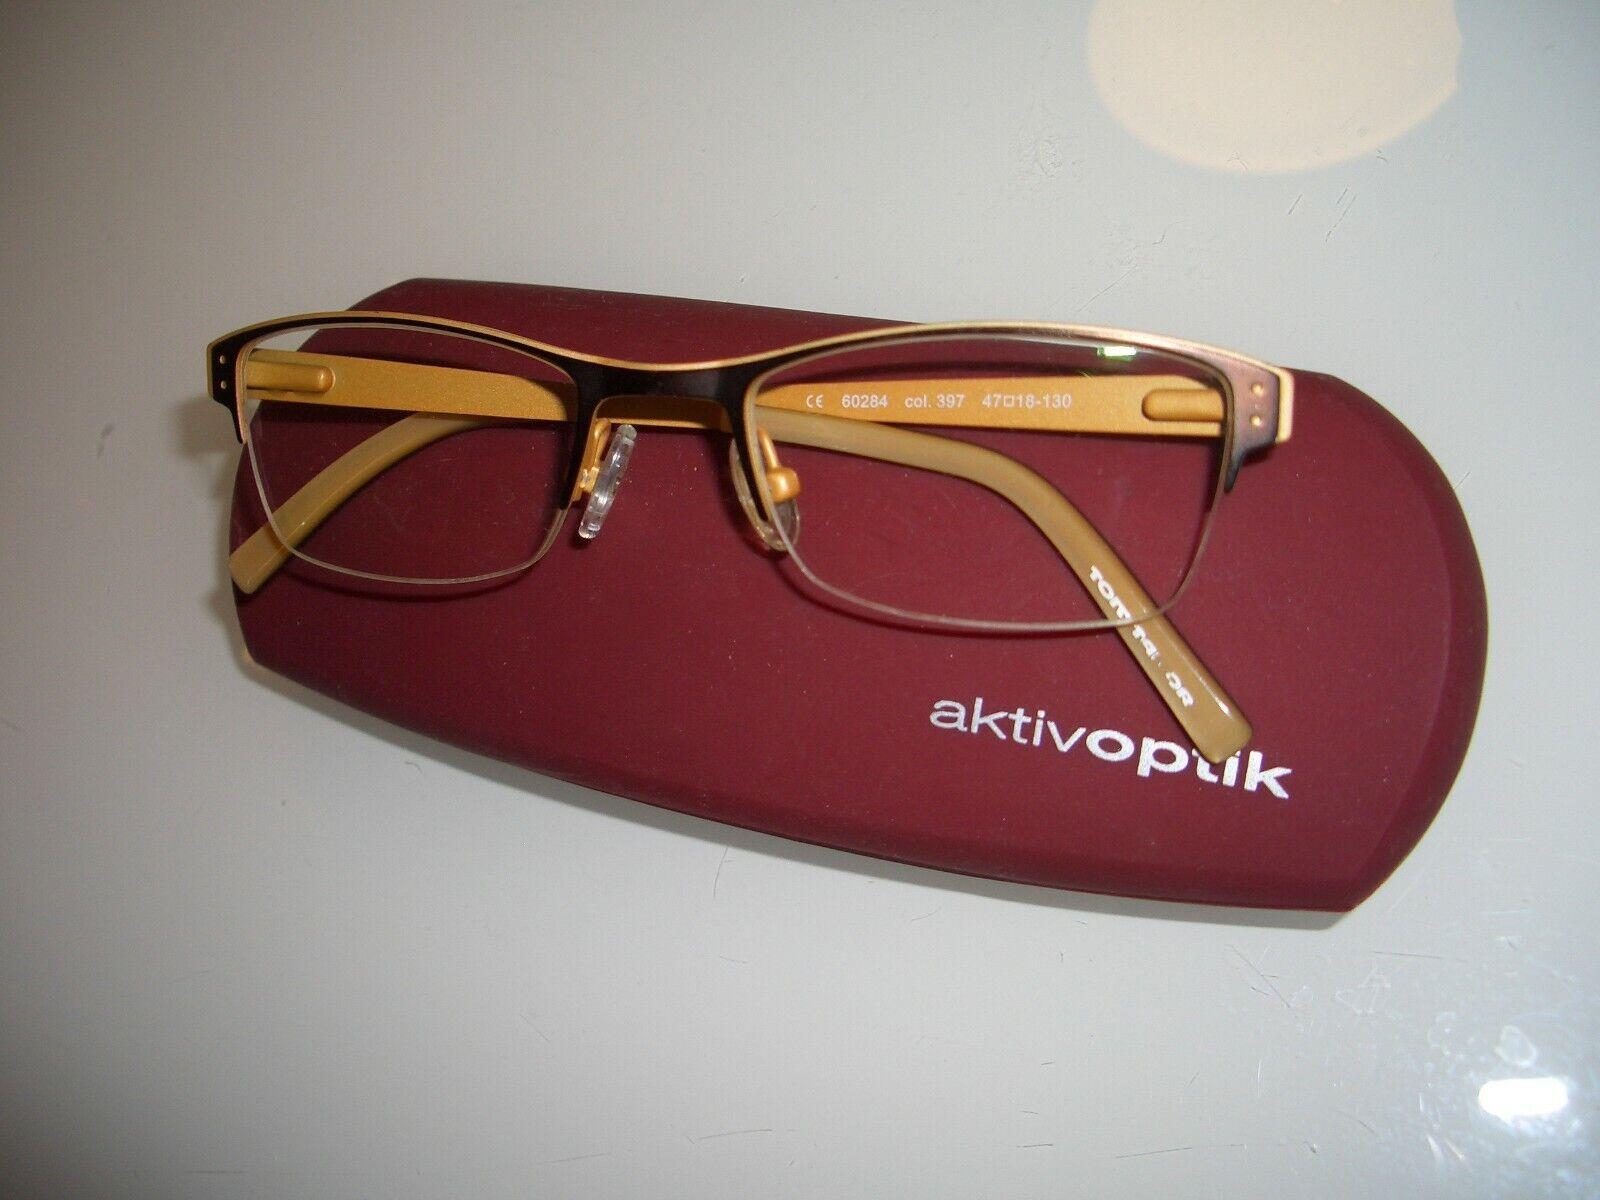 Tom Tailor 60284  Brille Brillengestell Eyeglasses